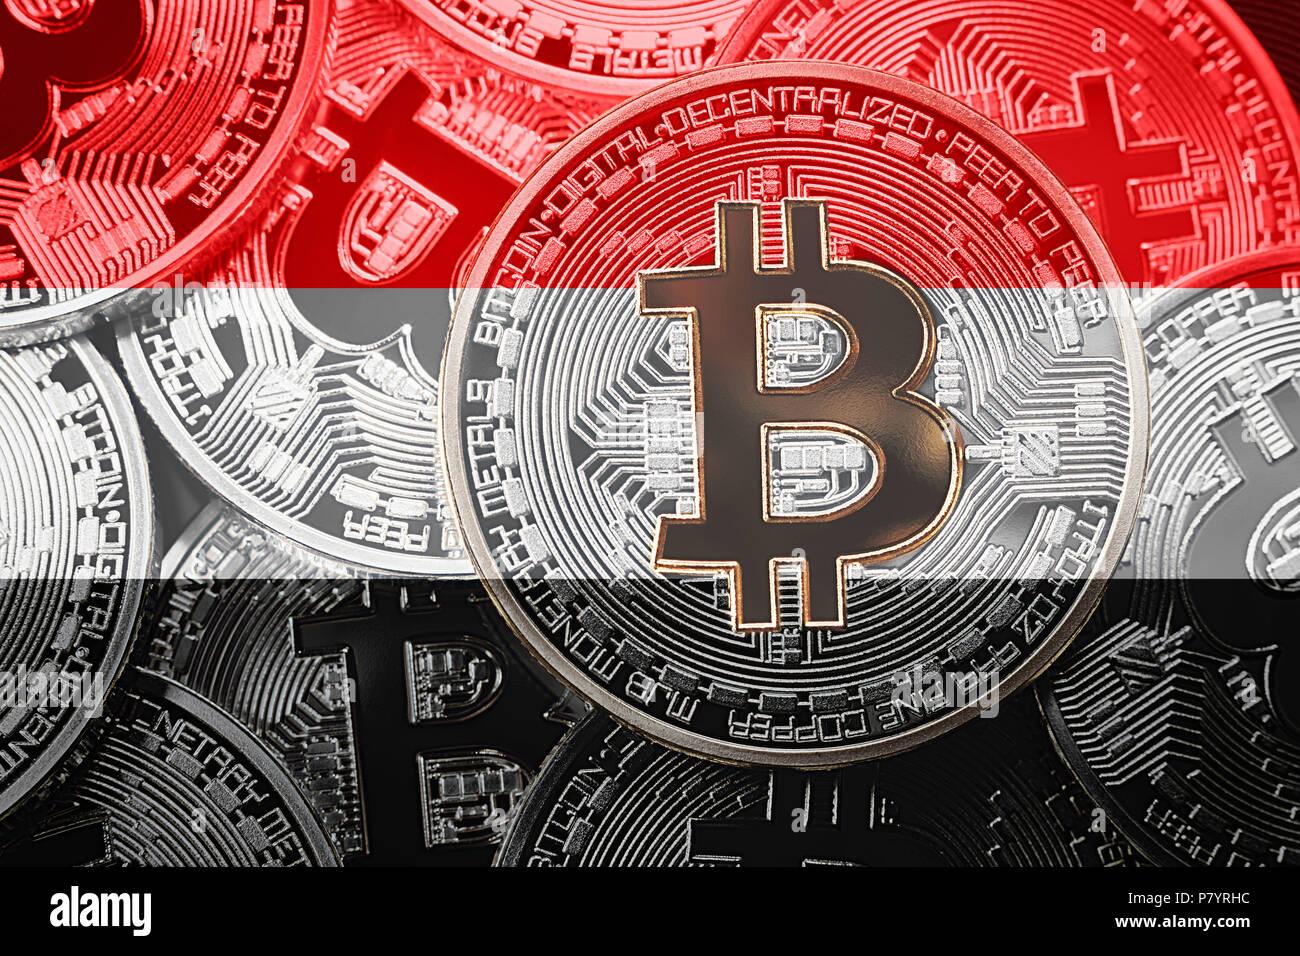 Stack of Bitcoin Yemen flag. Bitcoin cryptocurrencies concept. BTC background. Stock Photo